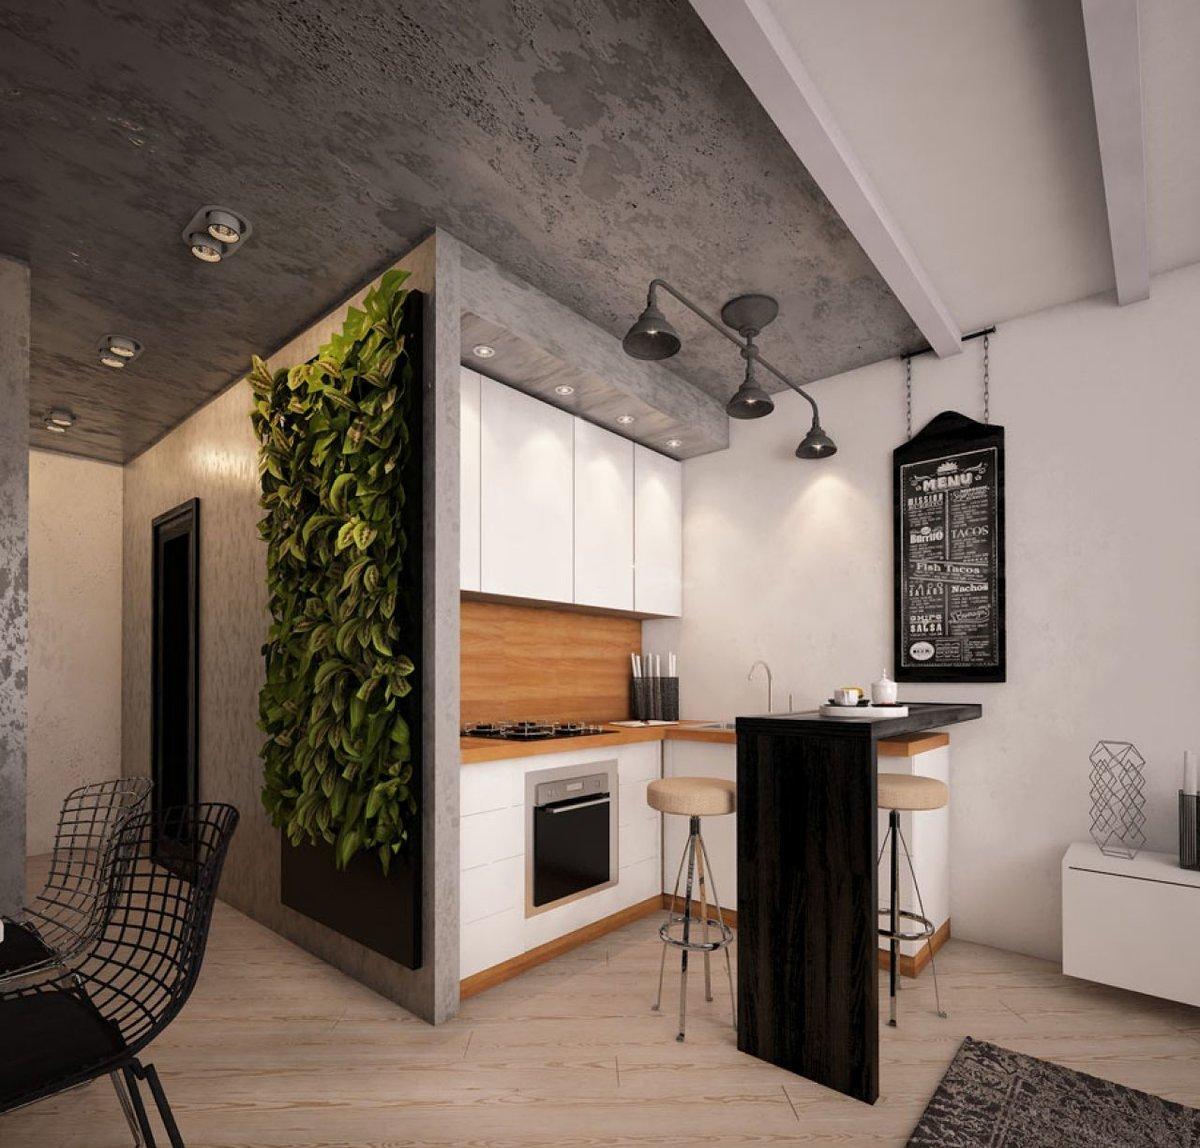 Кухня студия в стиле лофт